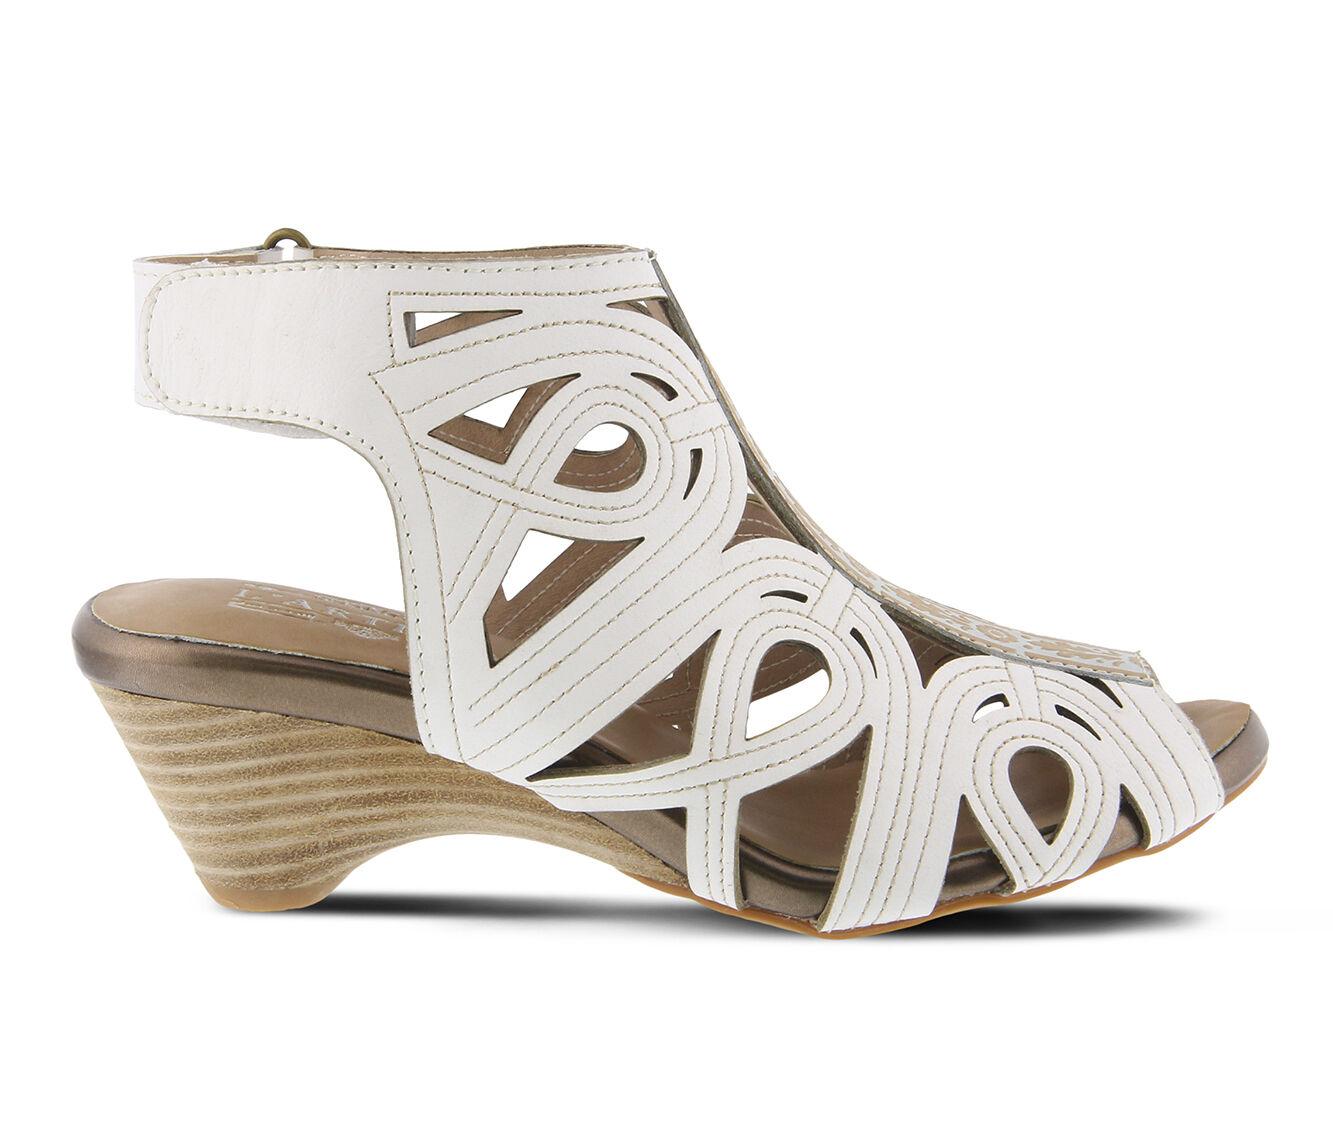 uk shoes_kd2747